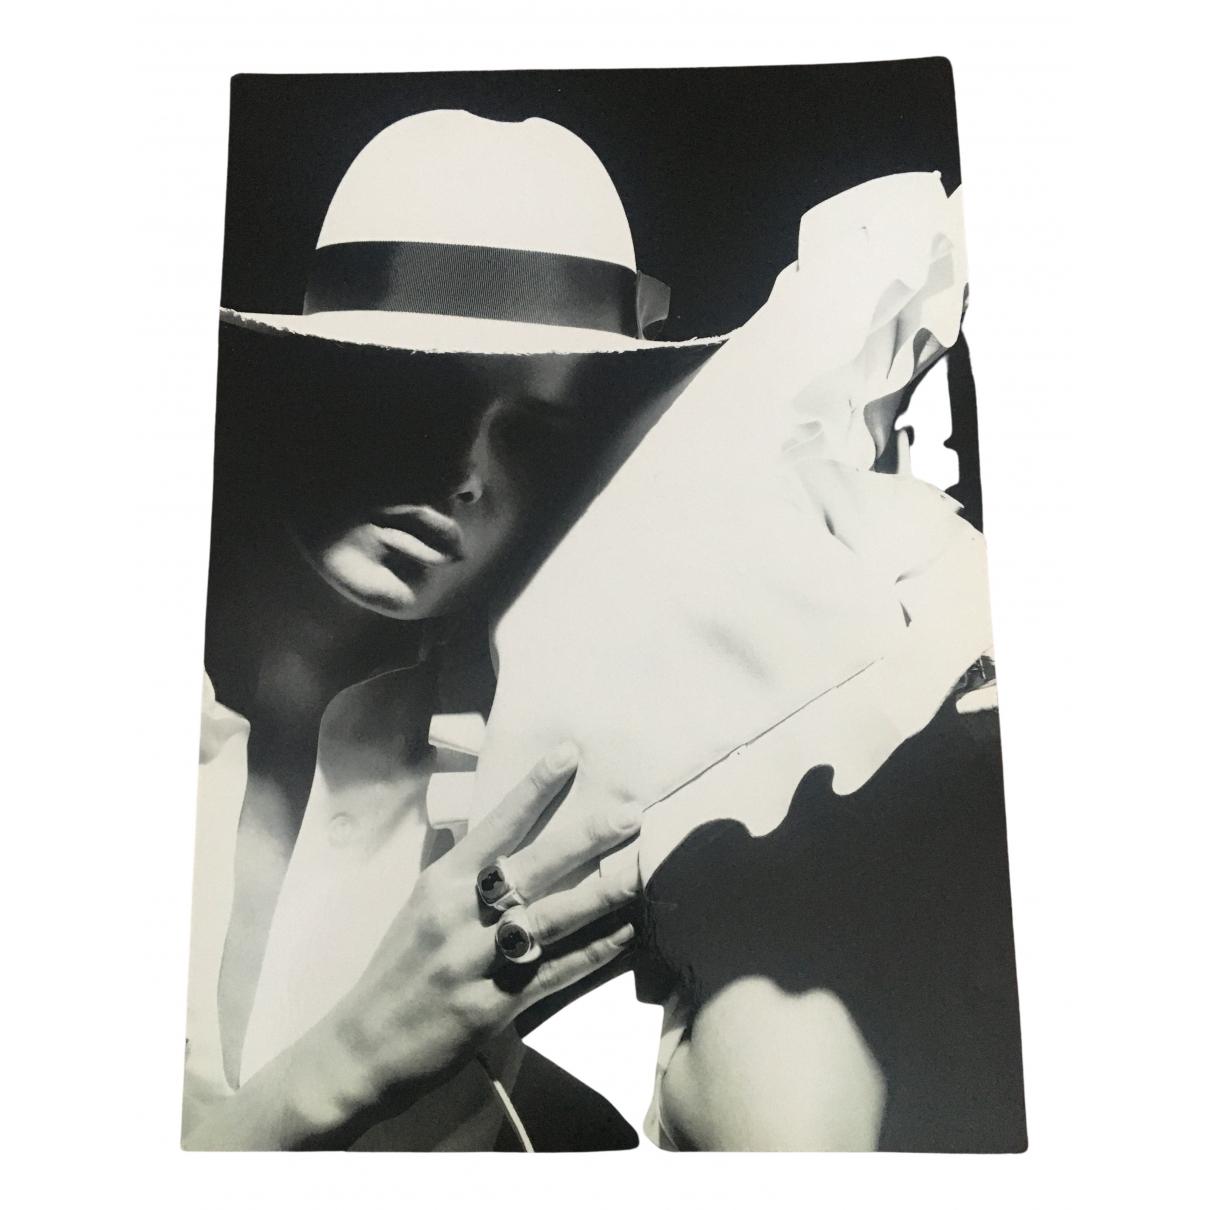 Karl Lagerfeld N Black Photography for Life & Living N